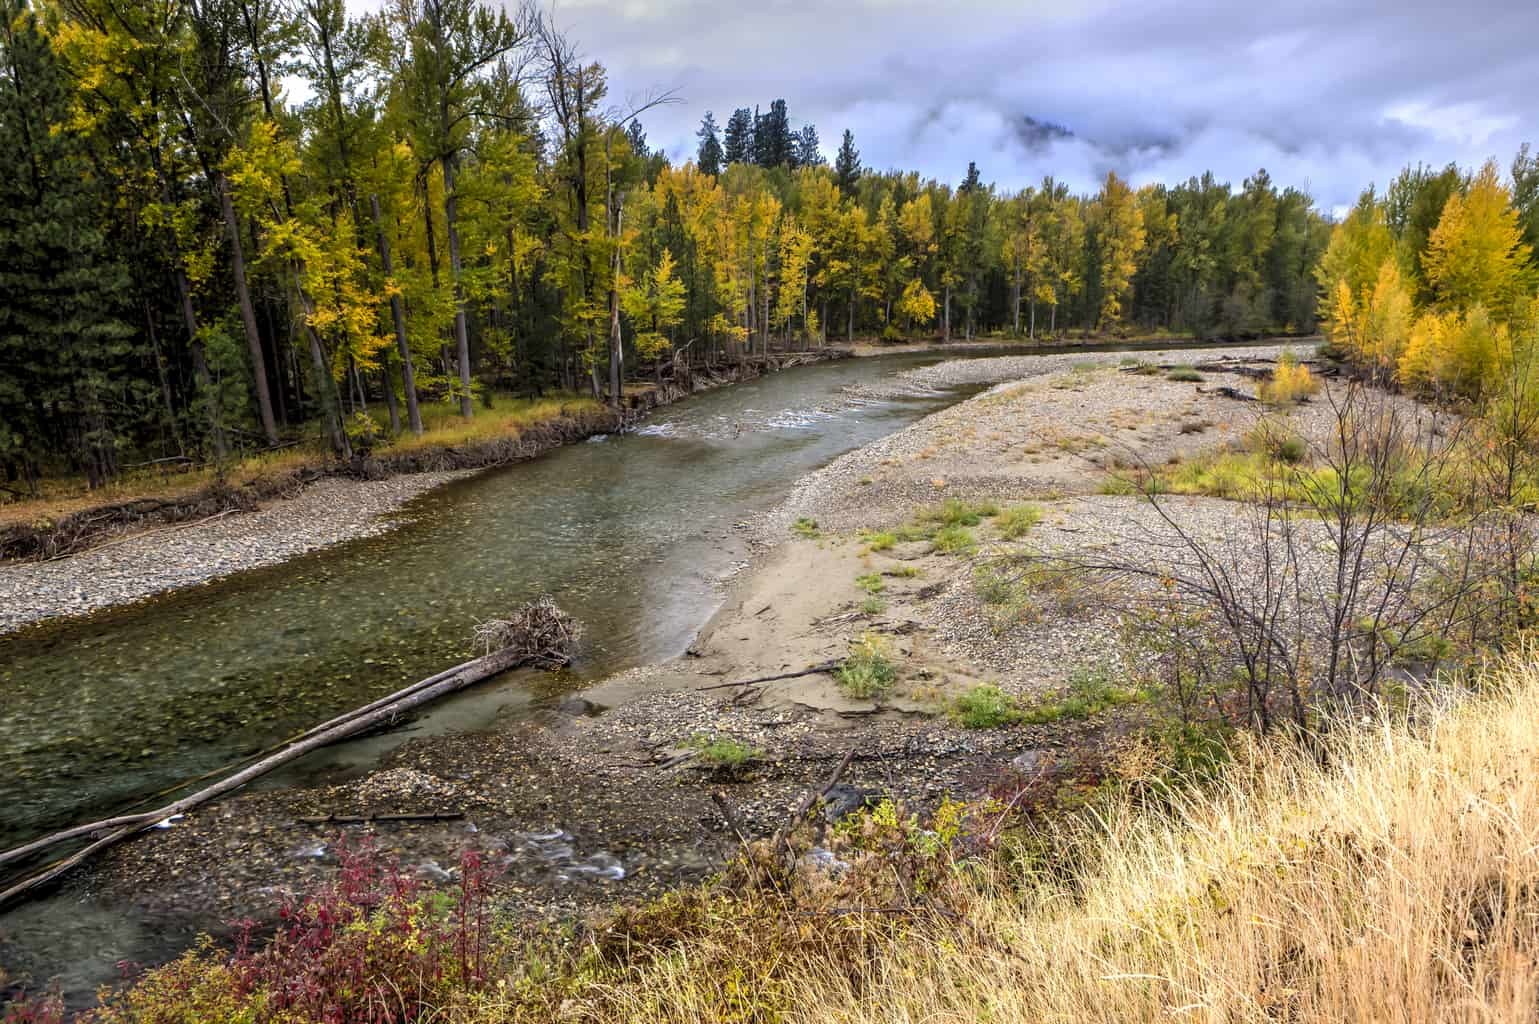 methow river near winthrop during autumn